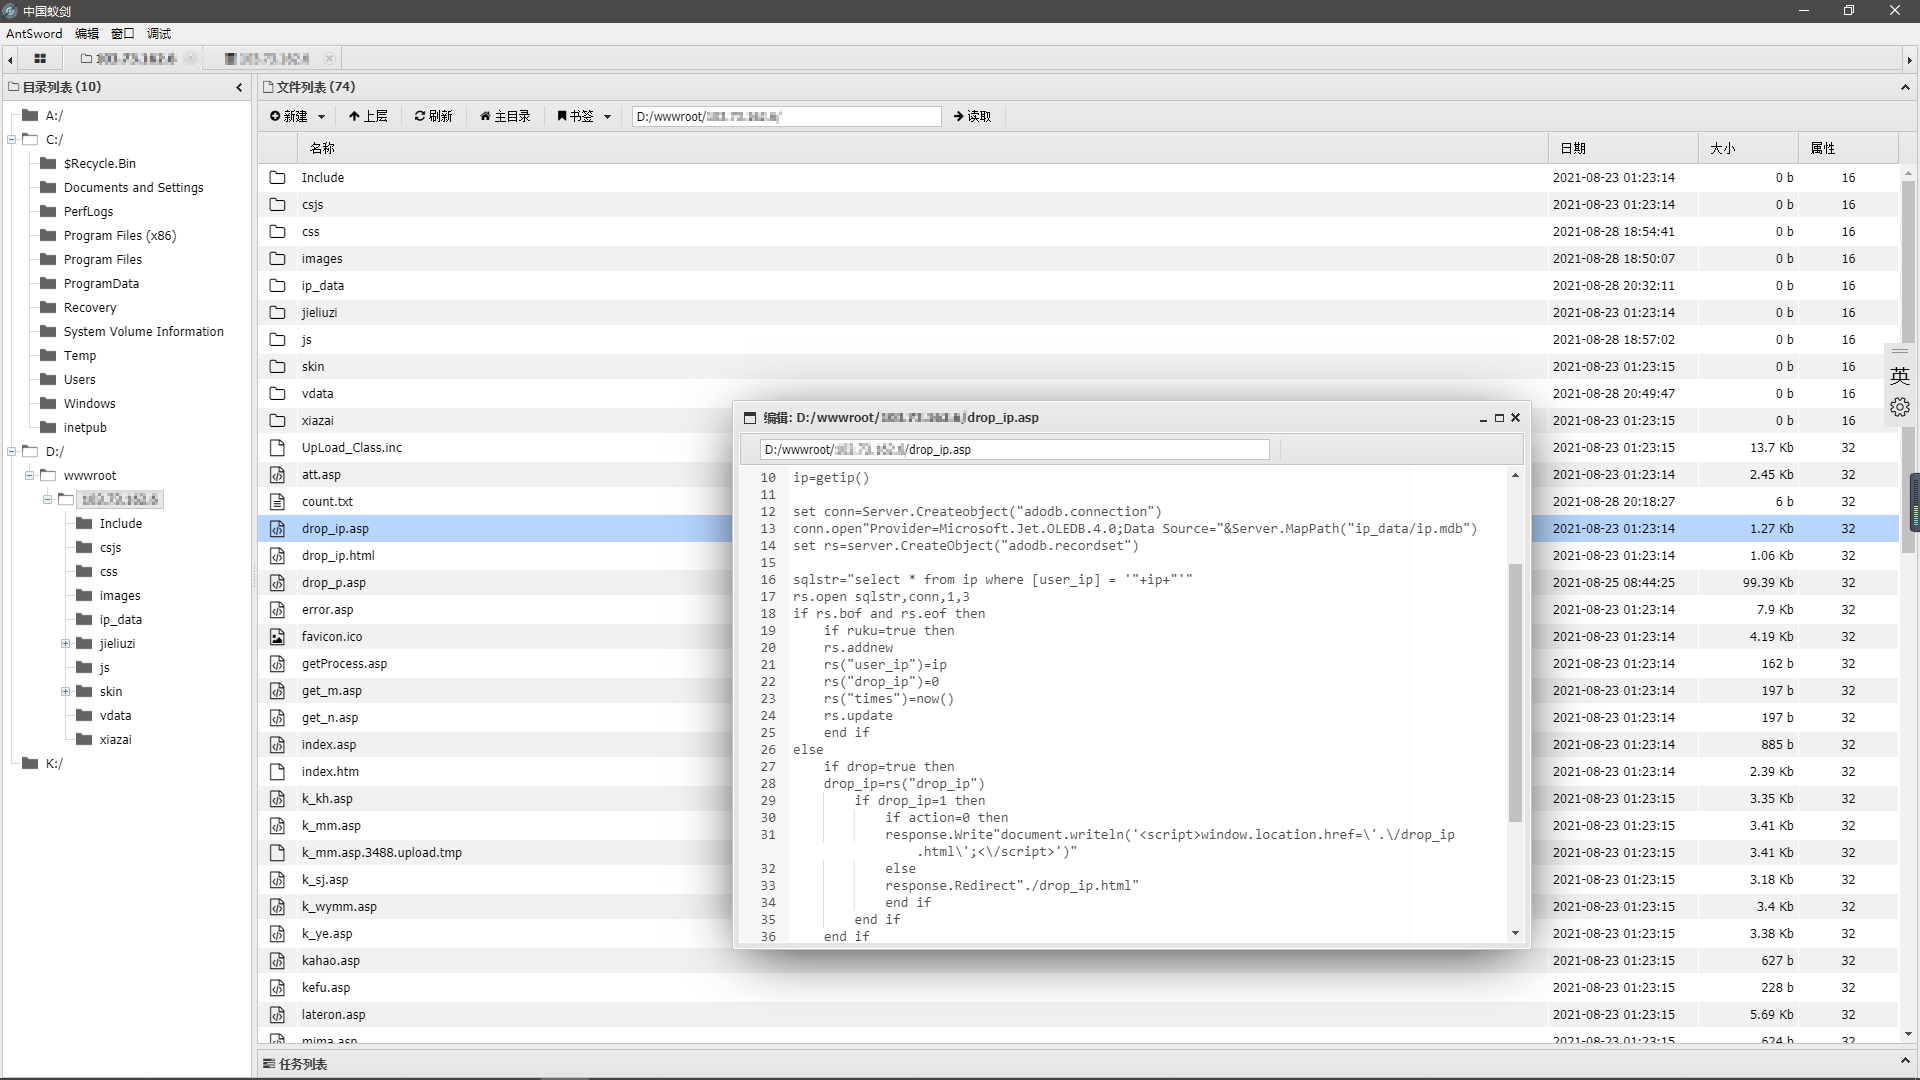 antsword-file-edit